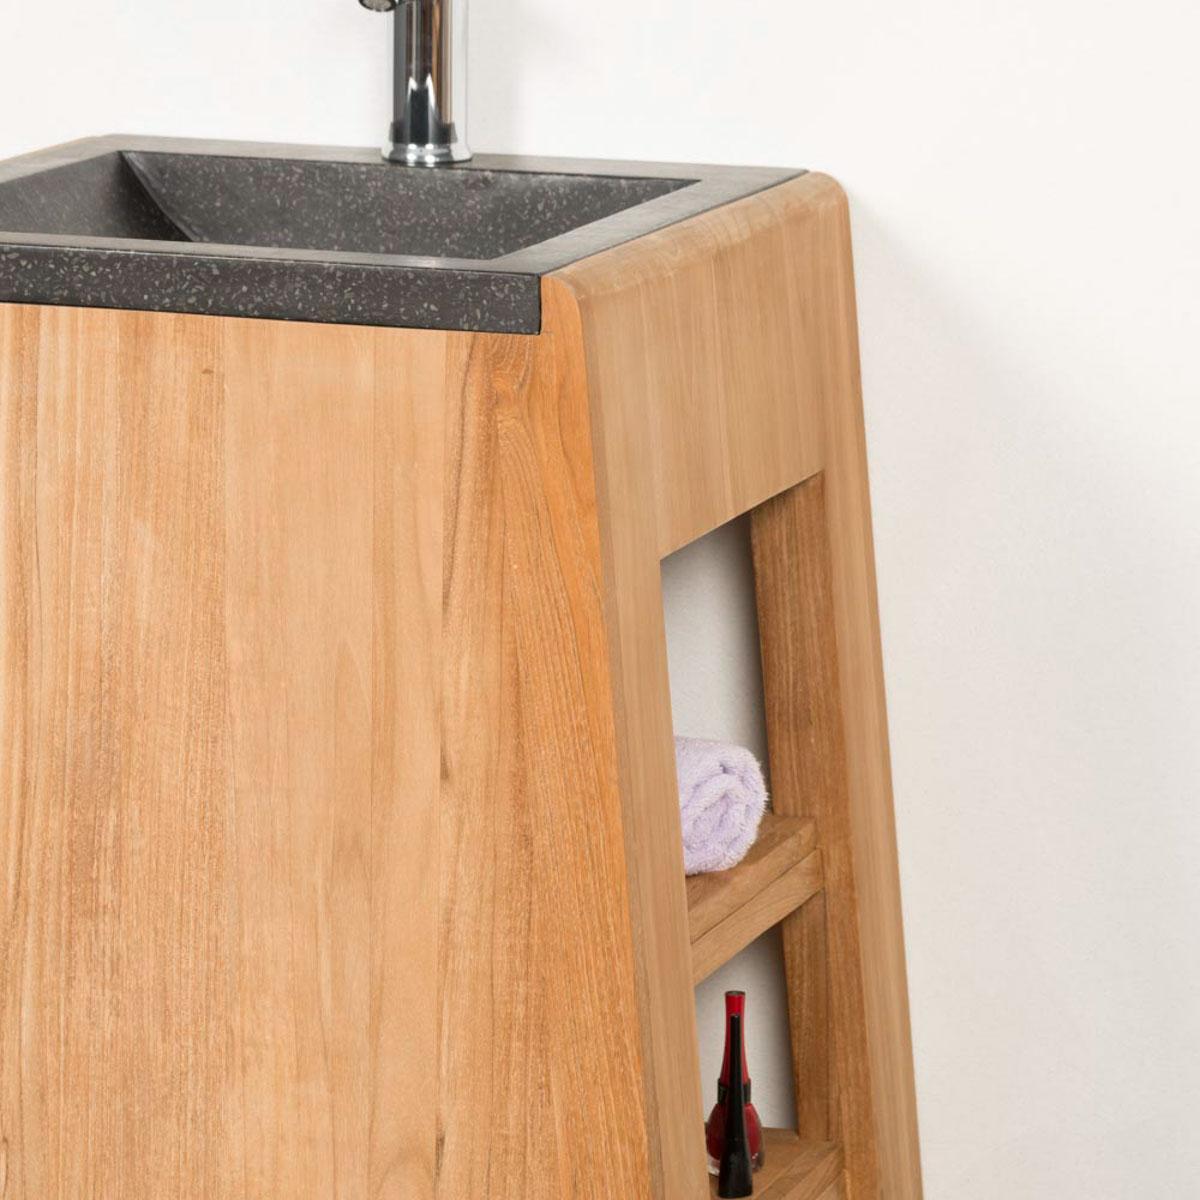 meuble salle de bain teck avec vasque terrazzo tipi 65 cm. Black Bedroom Furniture Sets. Home Design Ideas